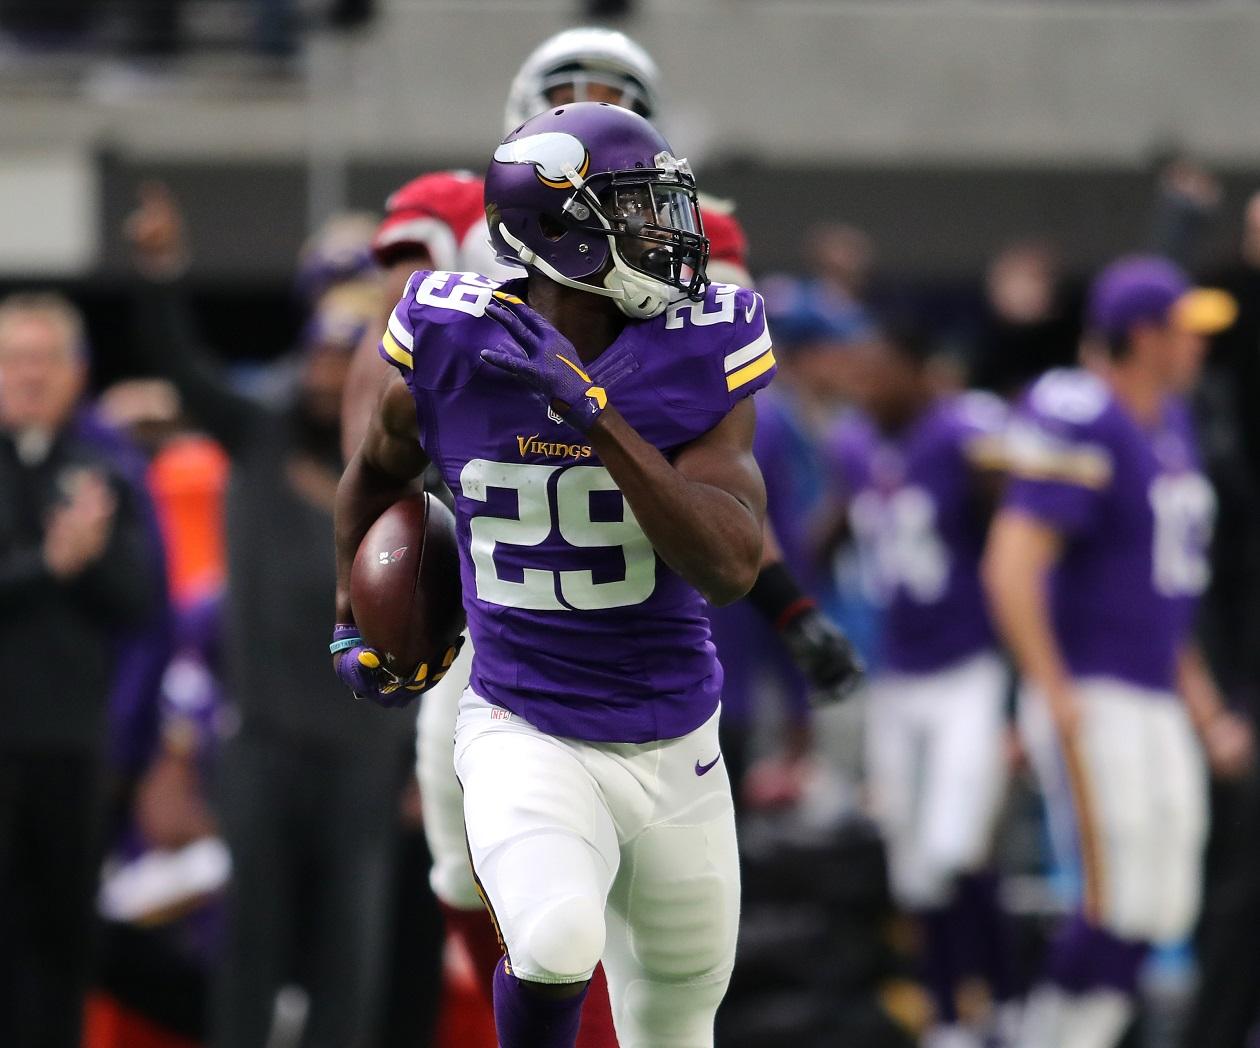 Xavier Rhodes Minnesota Vikings RCB NFL and PFF stats